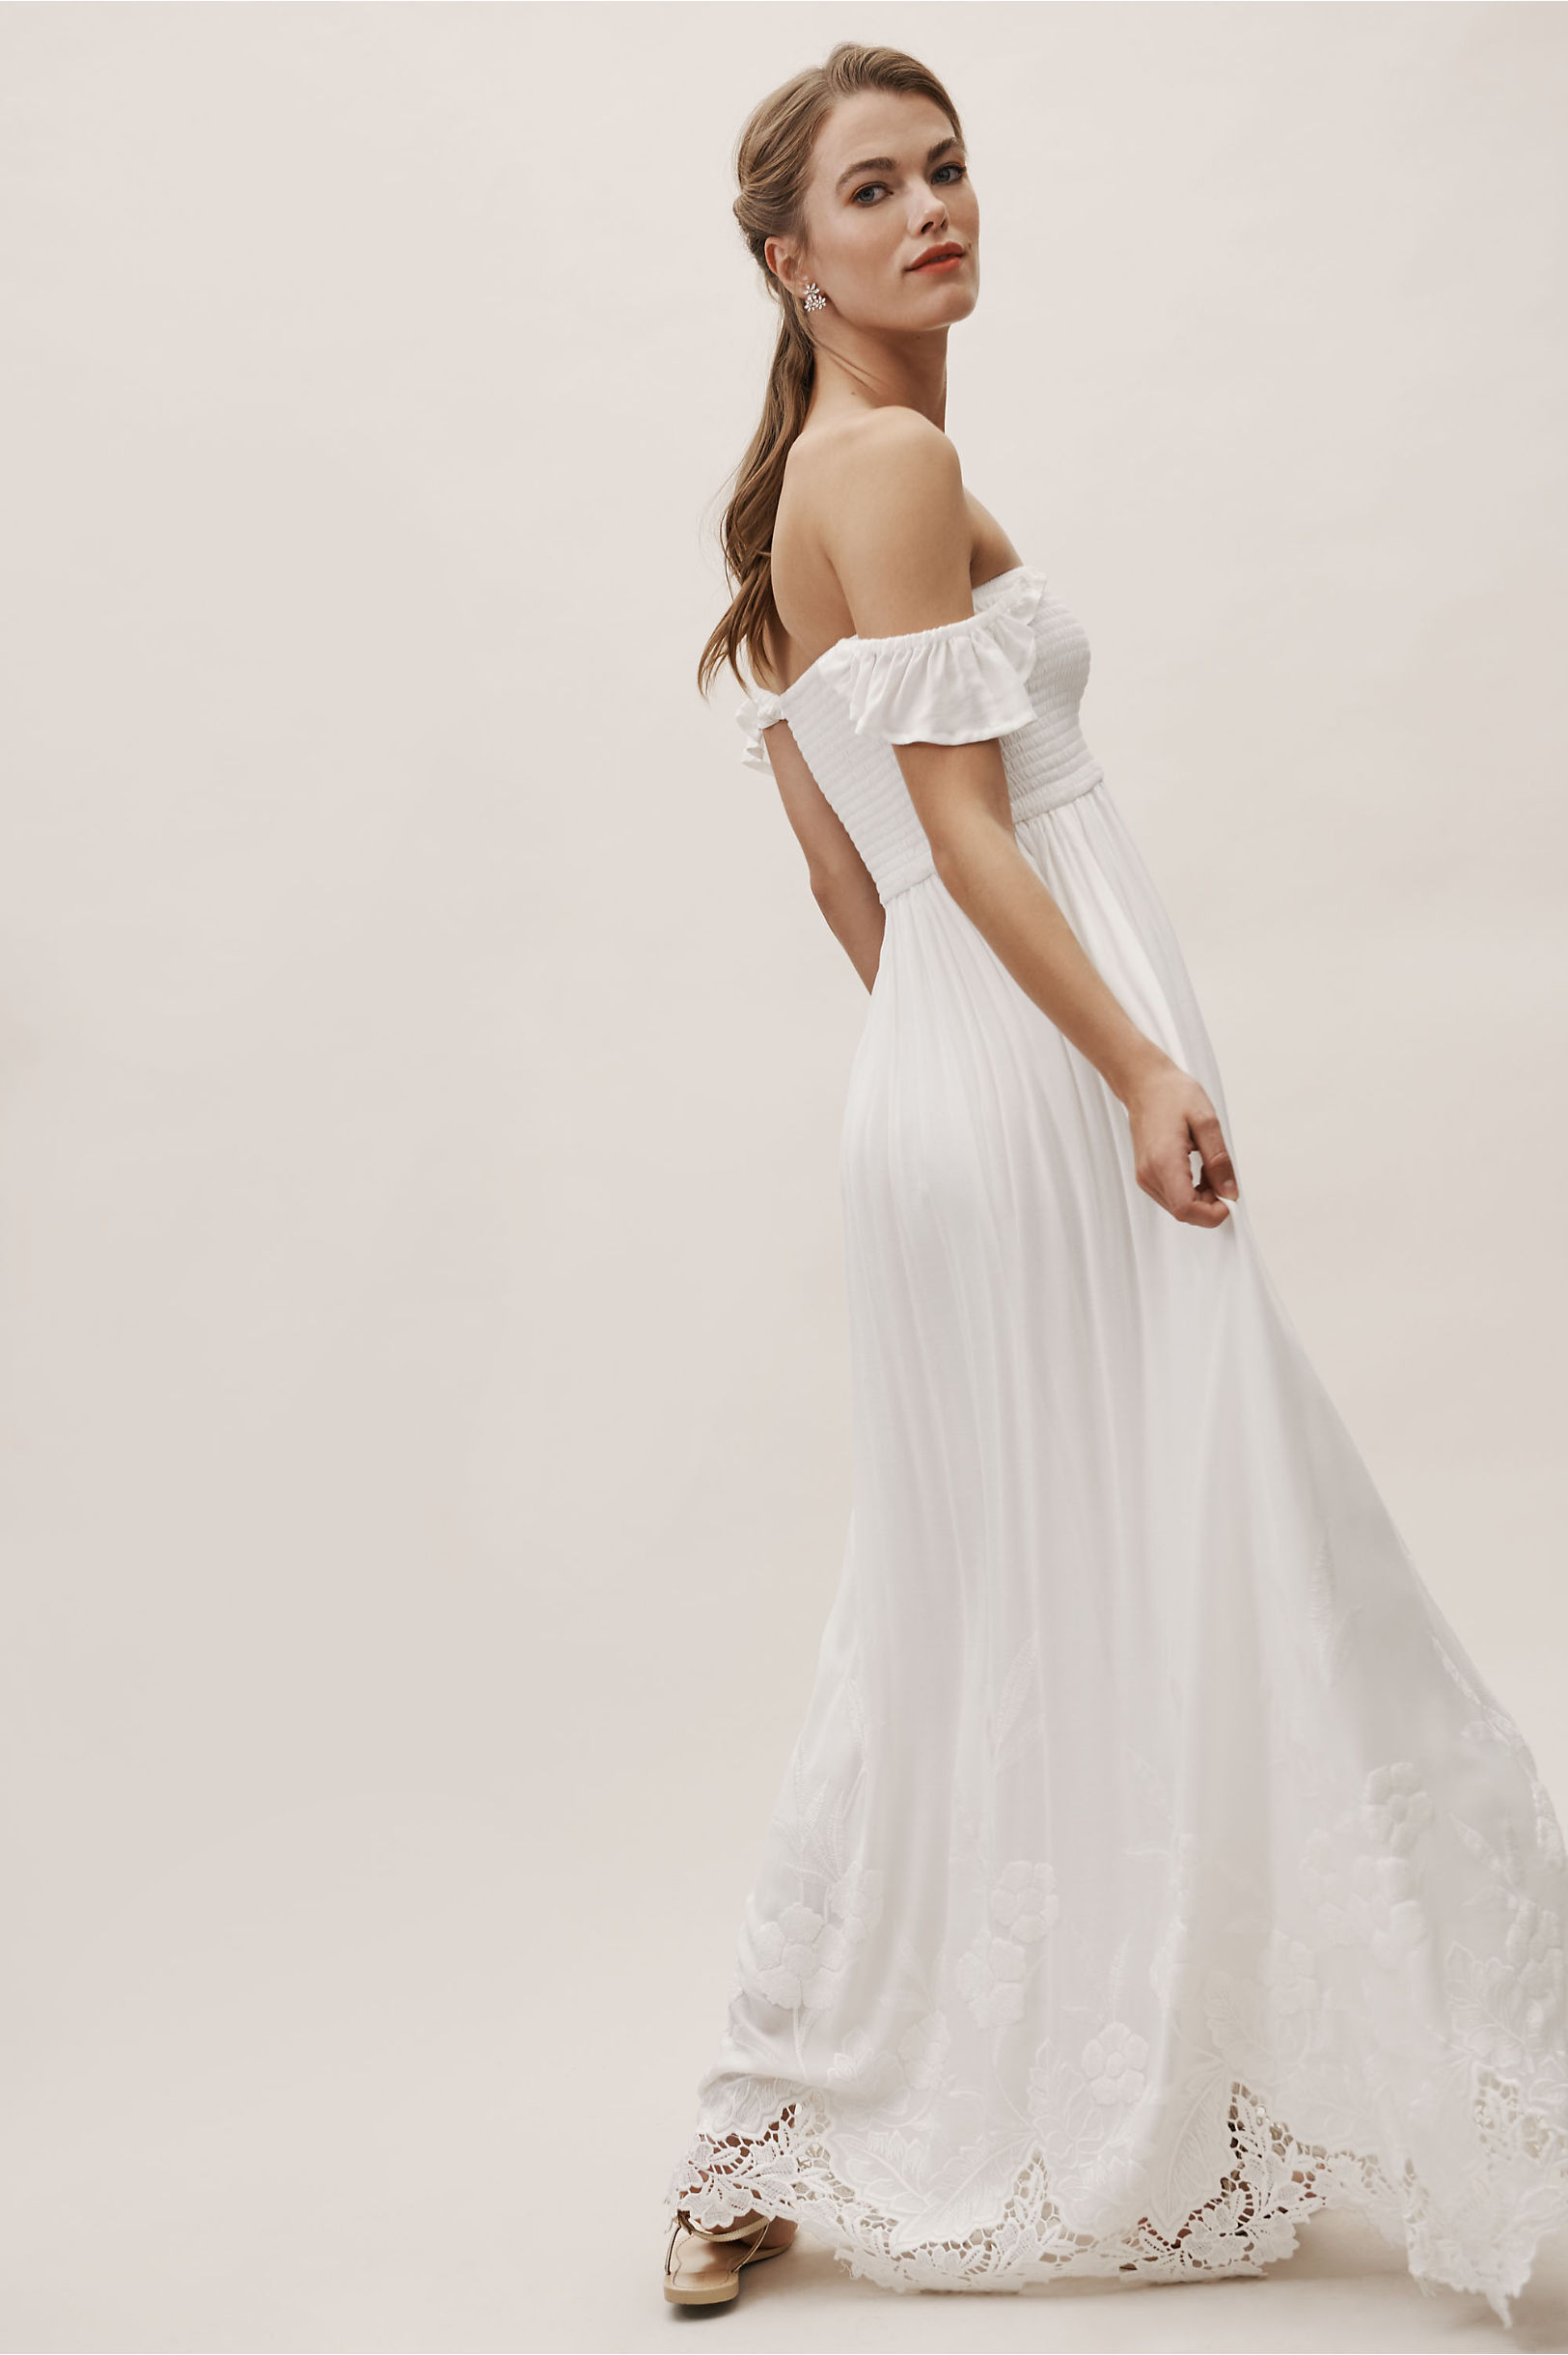 6db8e82401cba Plum Pretty Sugar Ivory Honor Off-The-Shoulder Dress